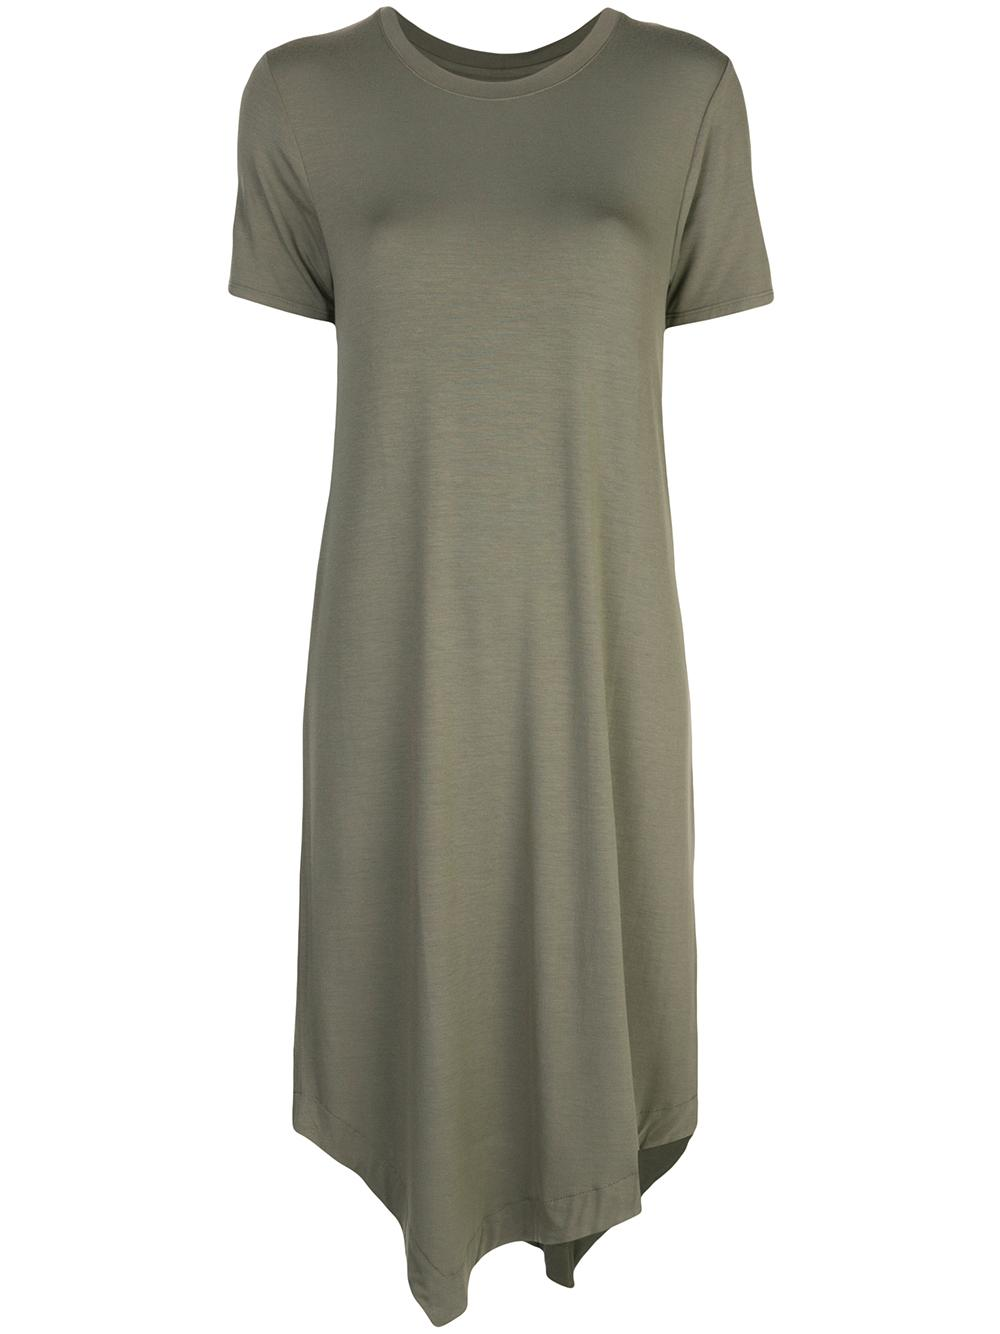 Short Sleeve Crew Asymmetrical Dress Item # M001-FRO059